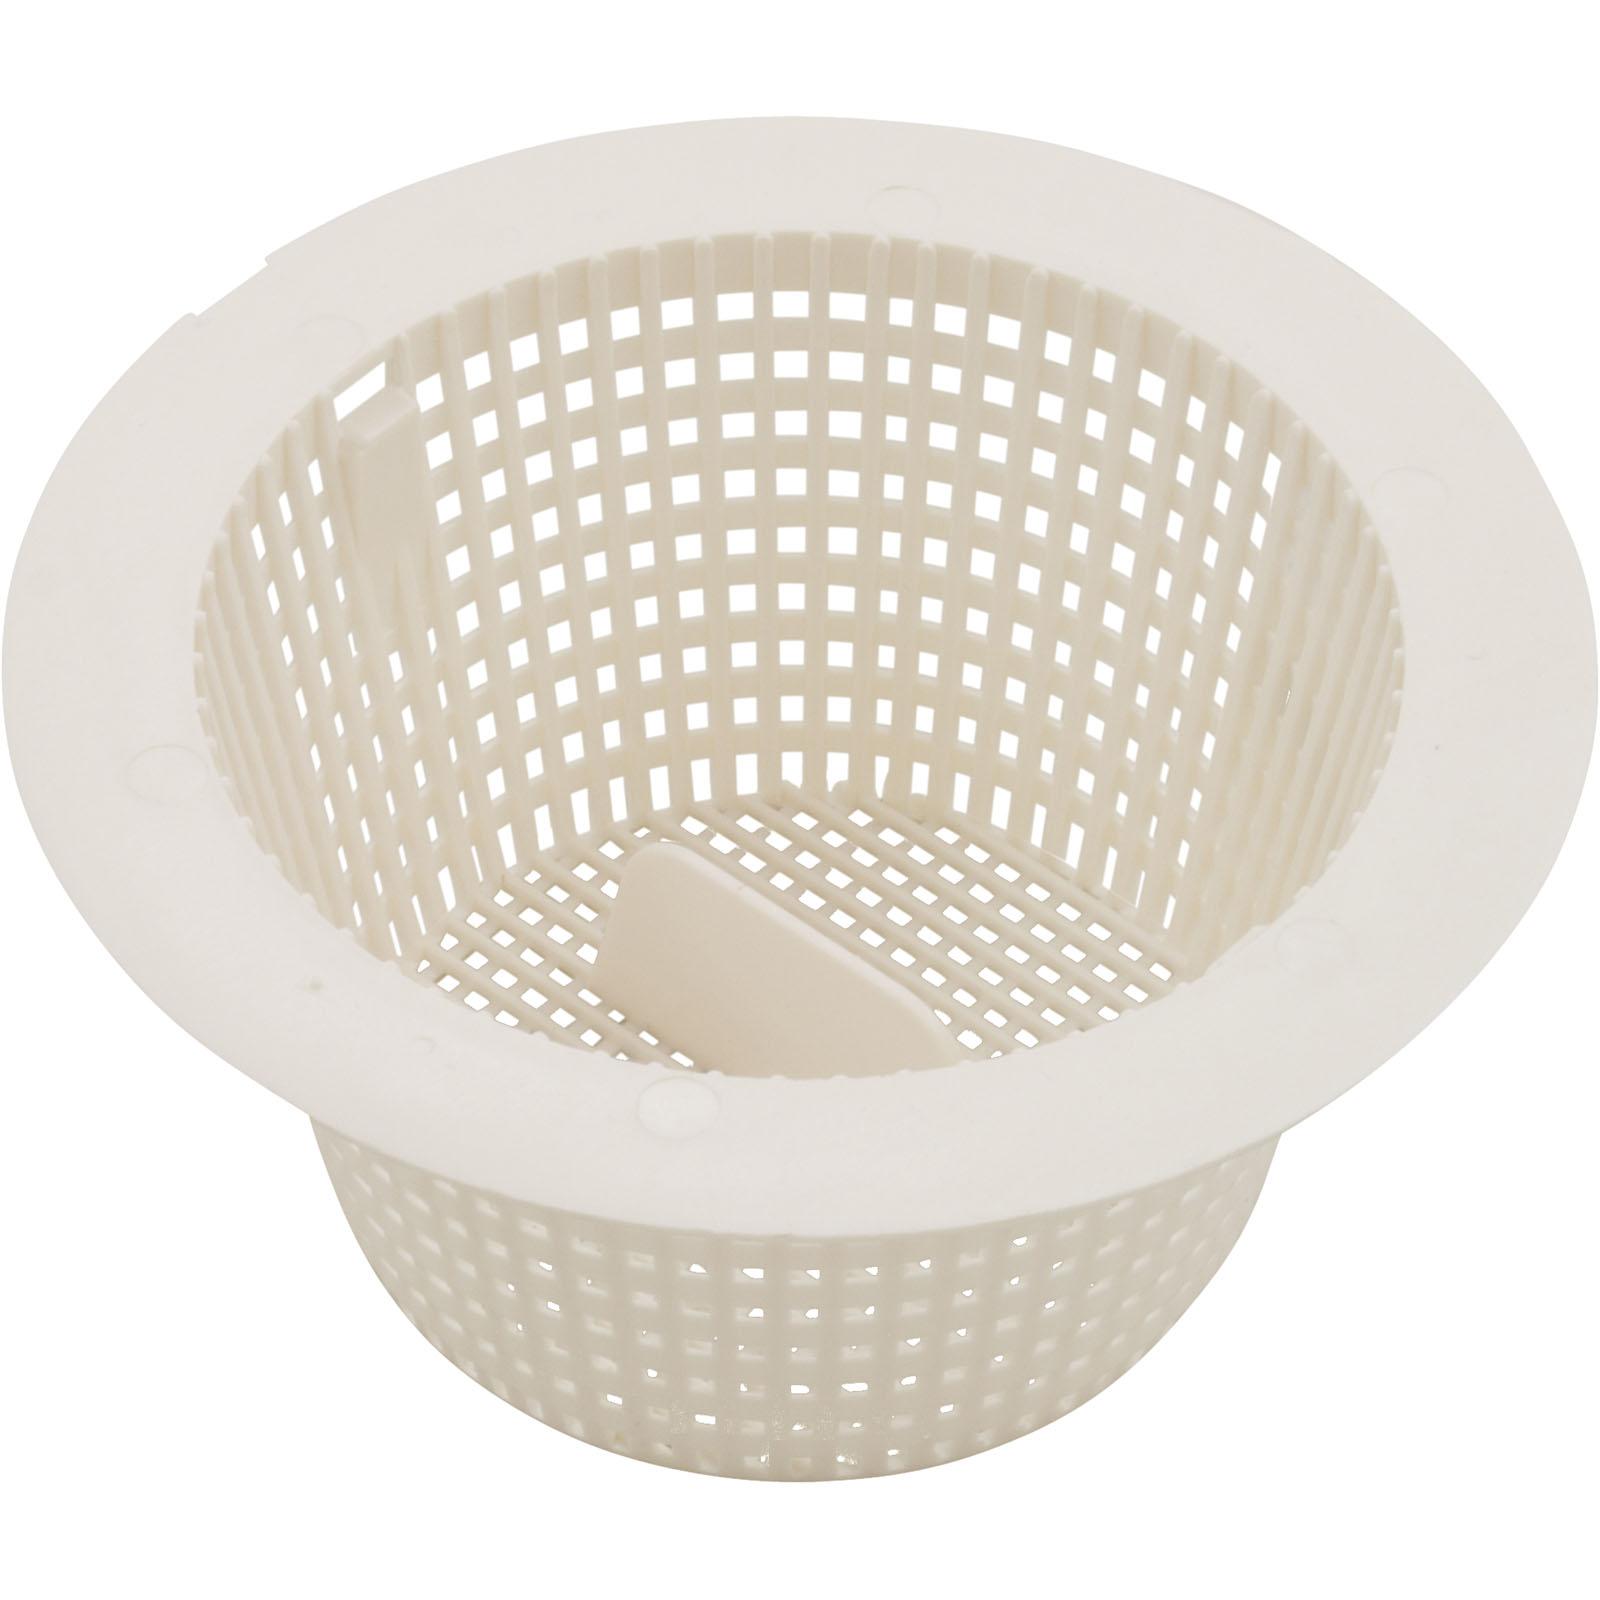 Basket Skimmer Astral Above Ground Ebay